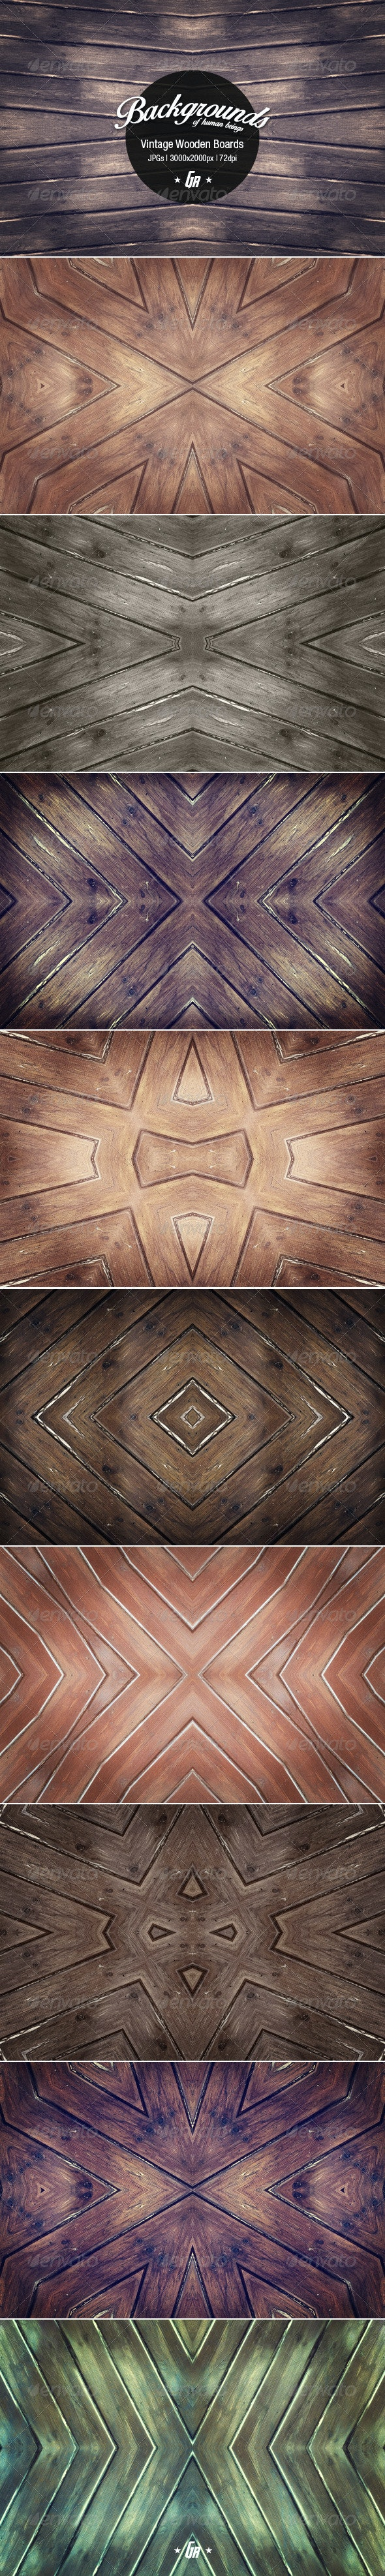 10 Vintage Wood Backgrounds - Nature Backgrounds